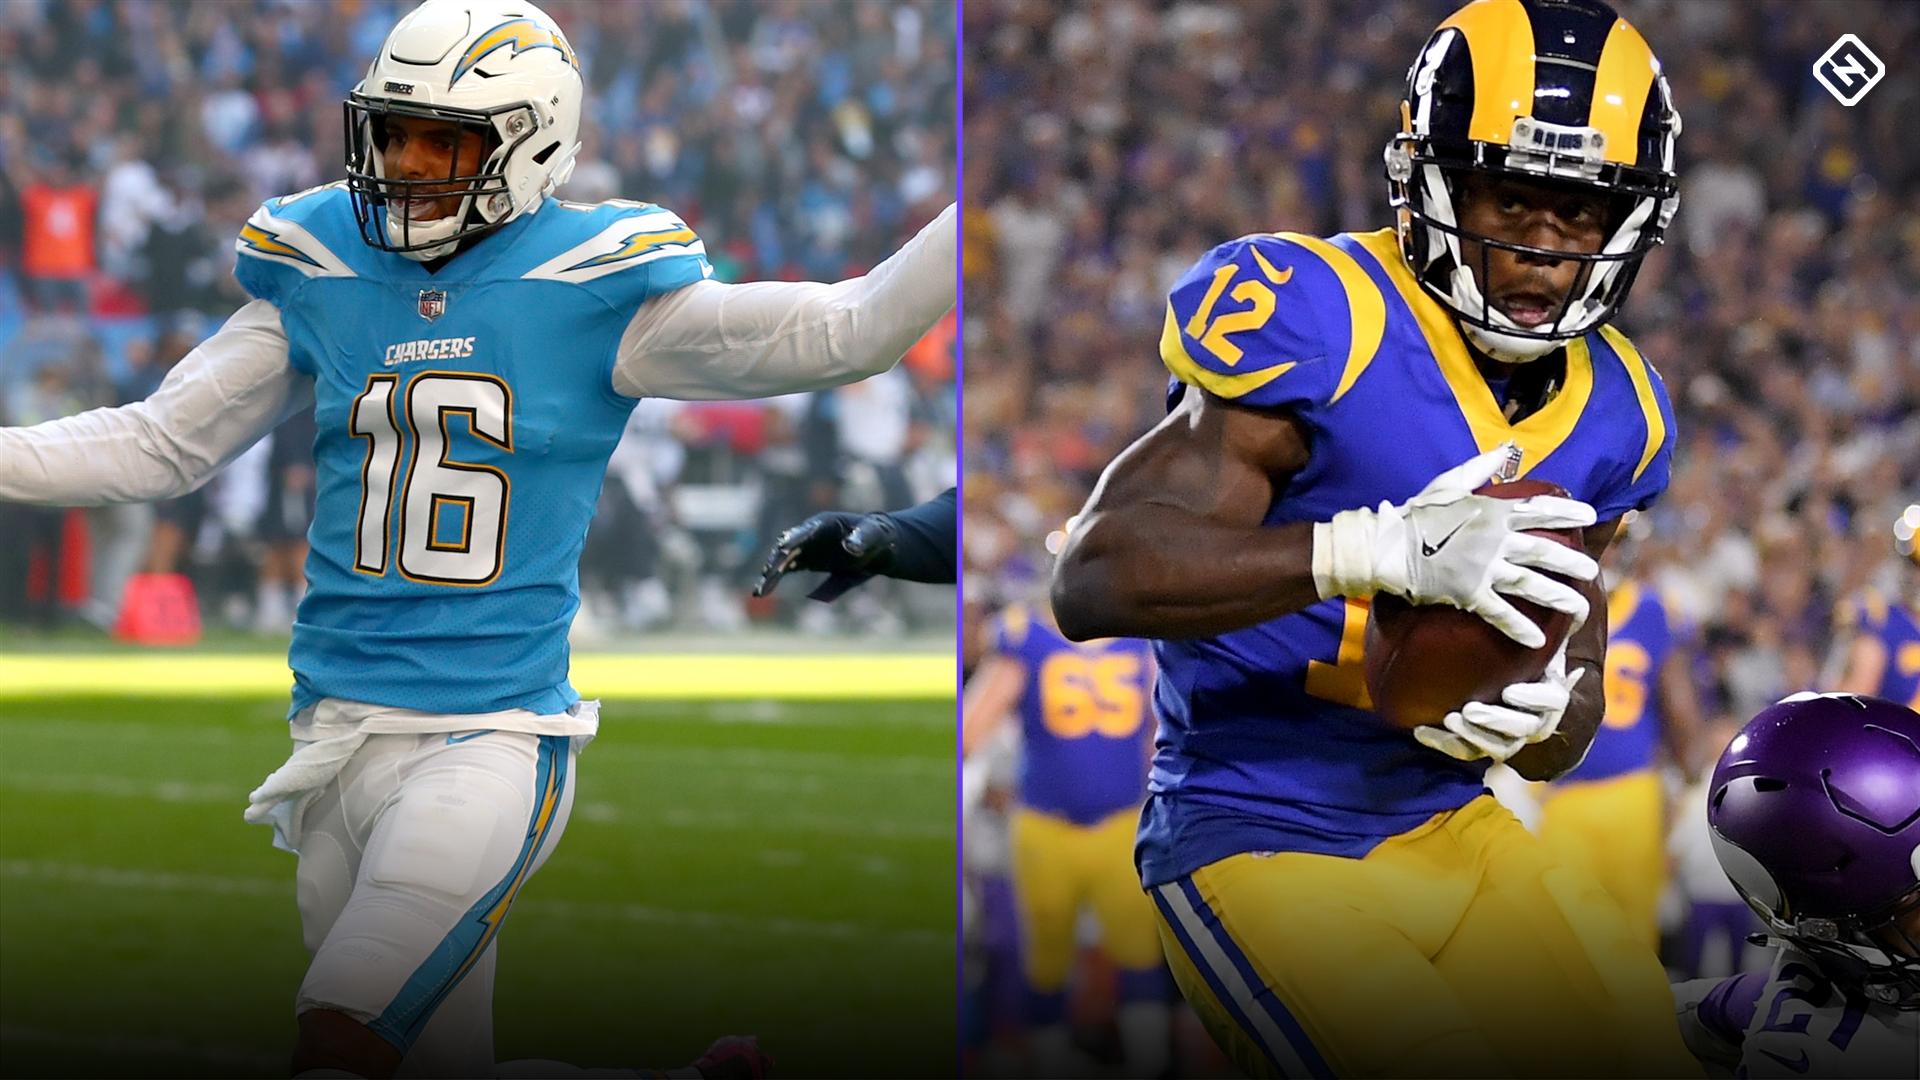 Flipboard: Week 9 Yahoo Fantasy Football: NFL DFS picks ...